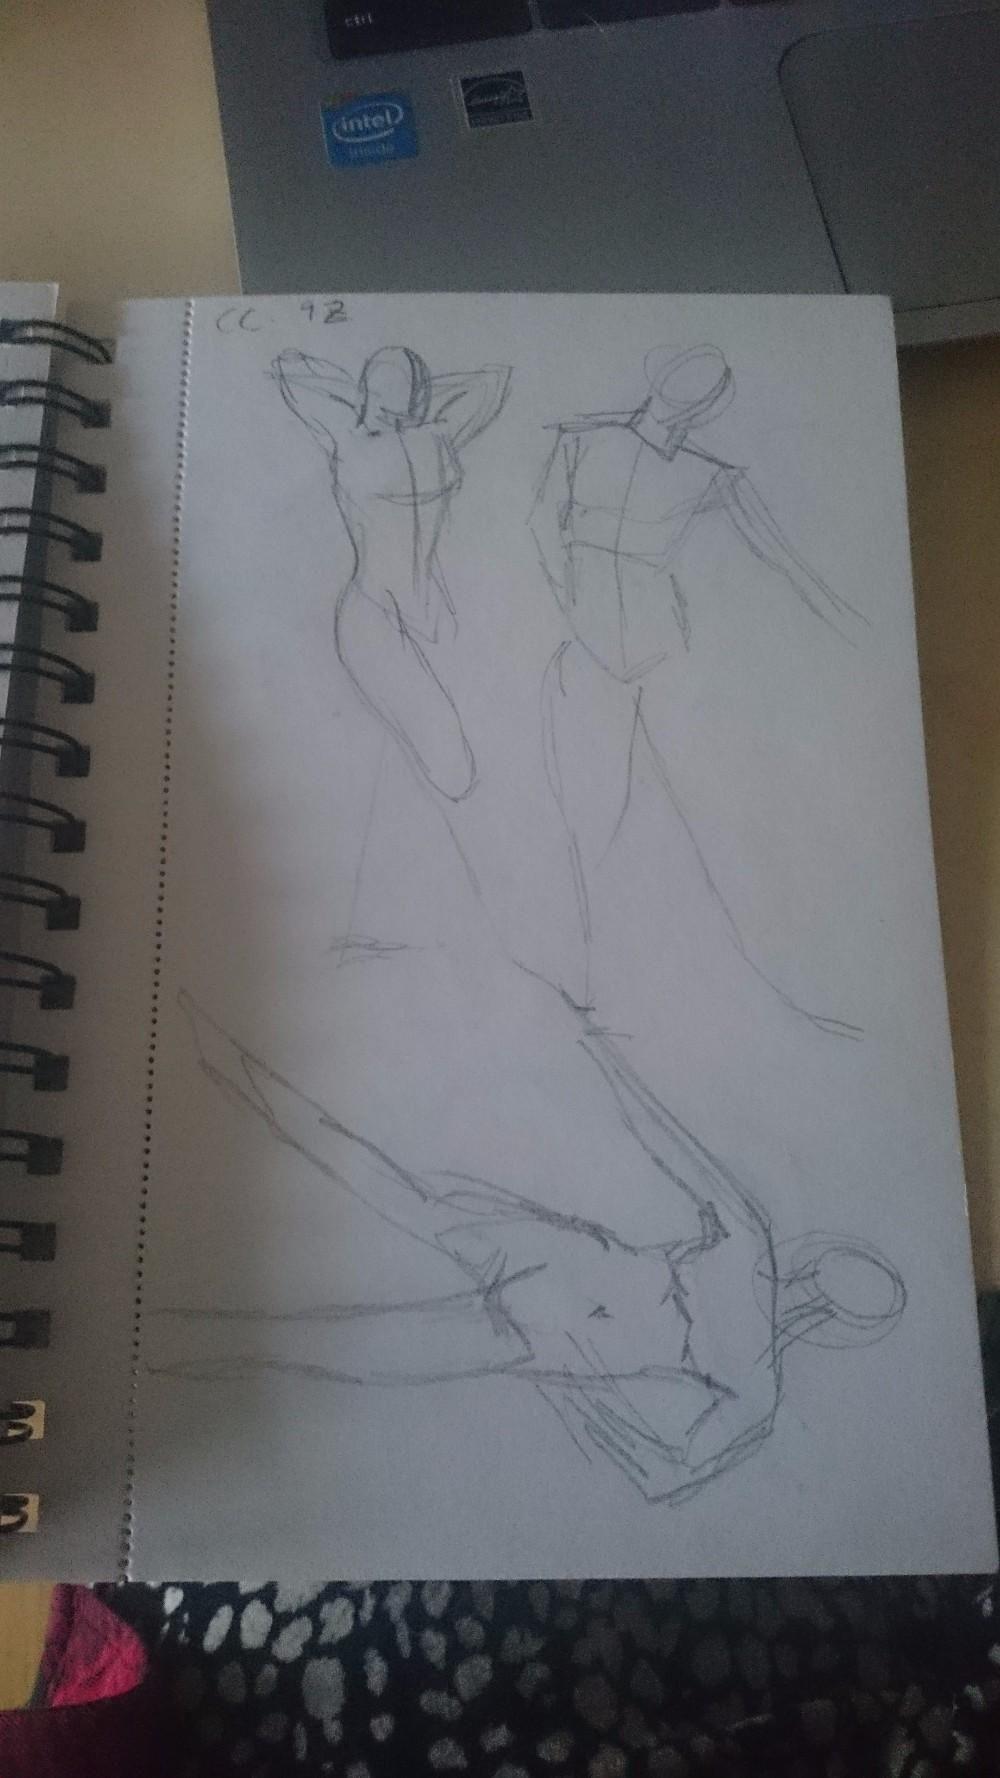 Sketchbook Magic - image 11 - student project